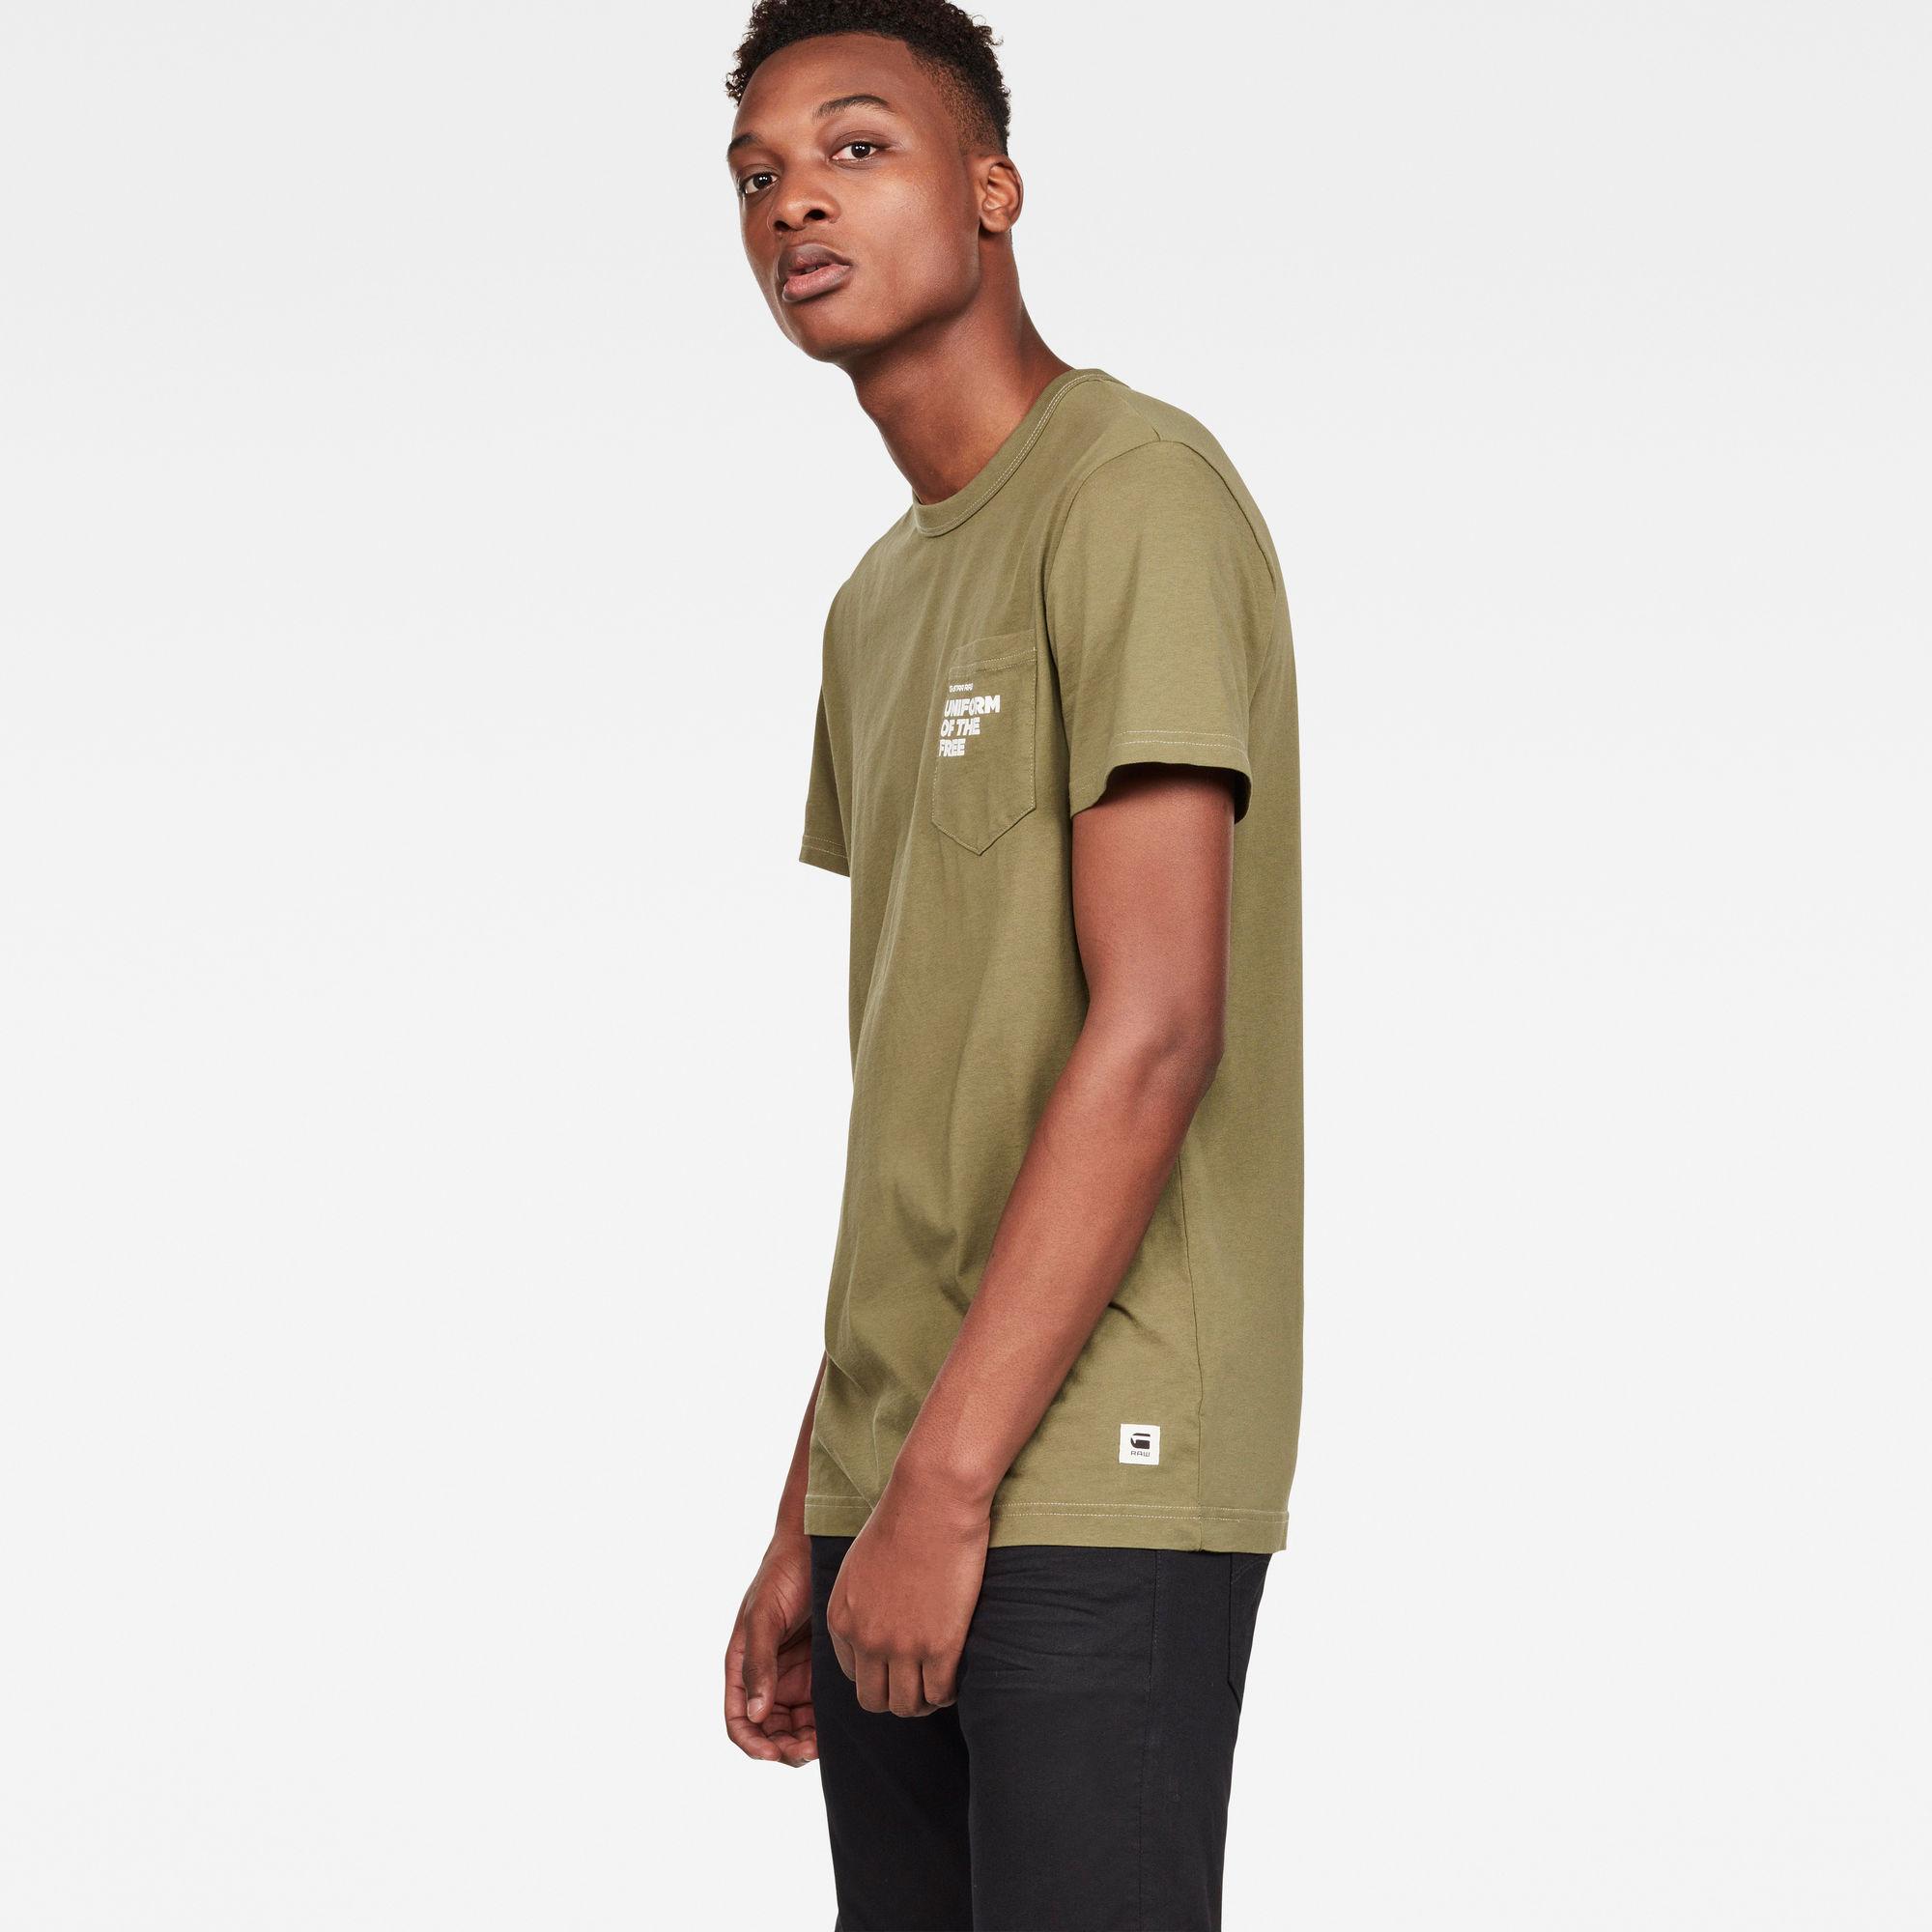 G-Star RAW Graphic 23 T-Shirt